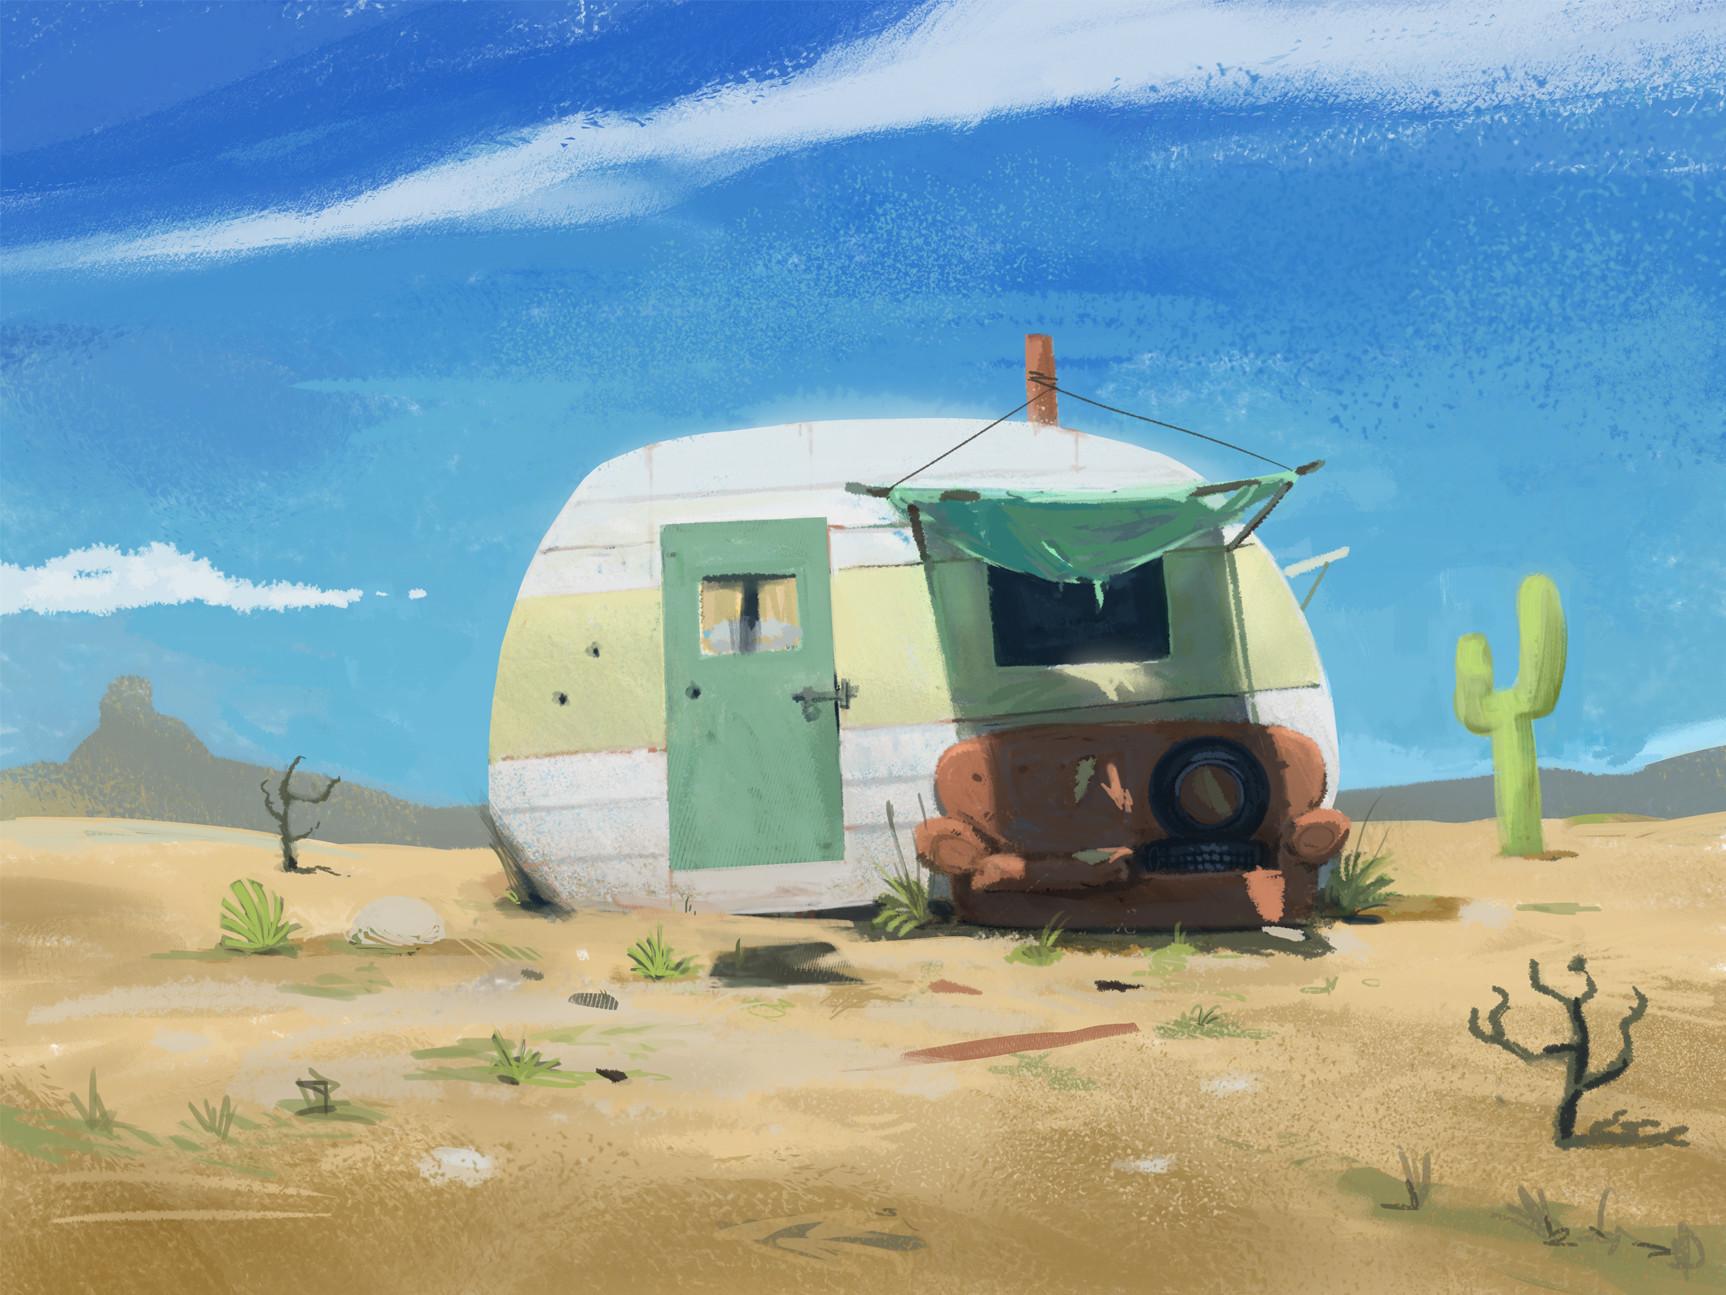 West clendinning rundown caravan small